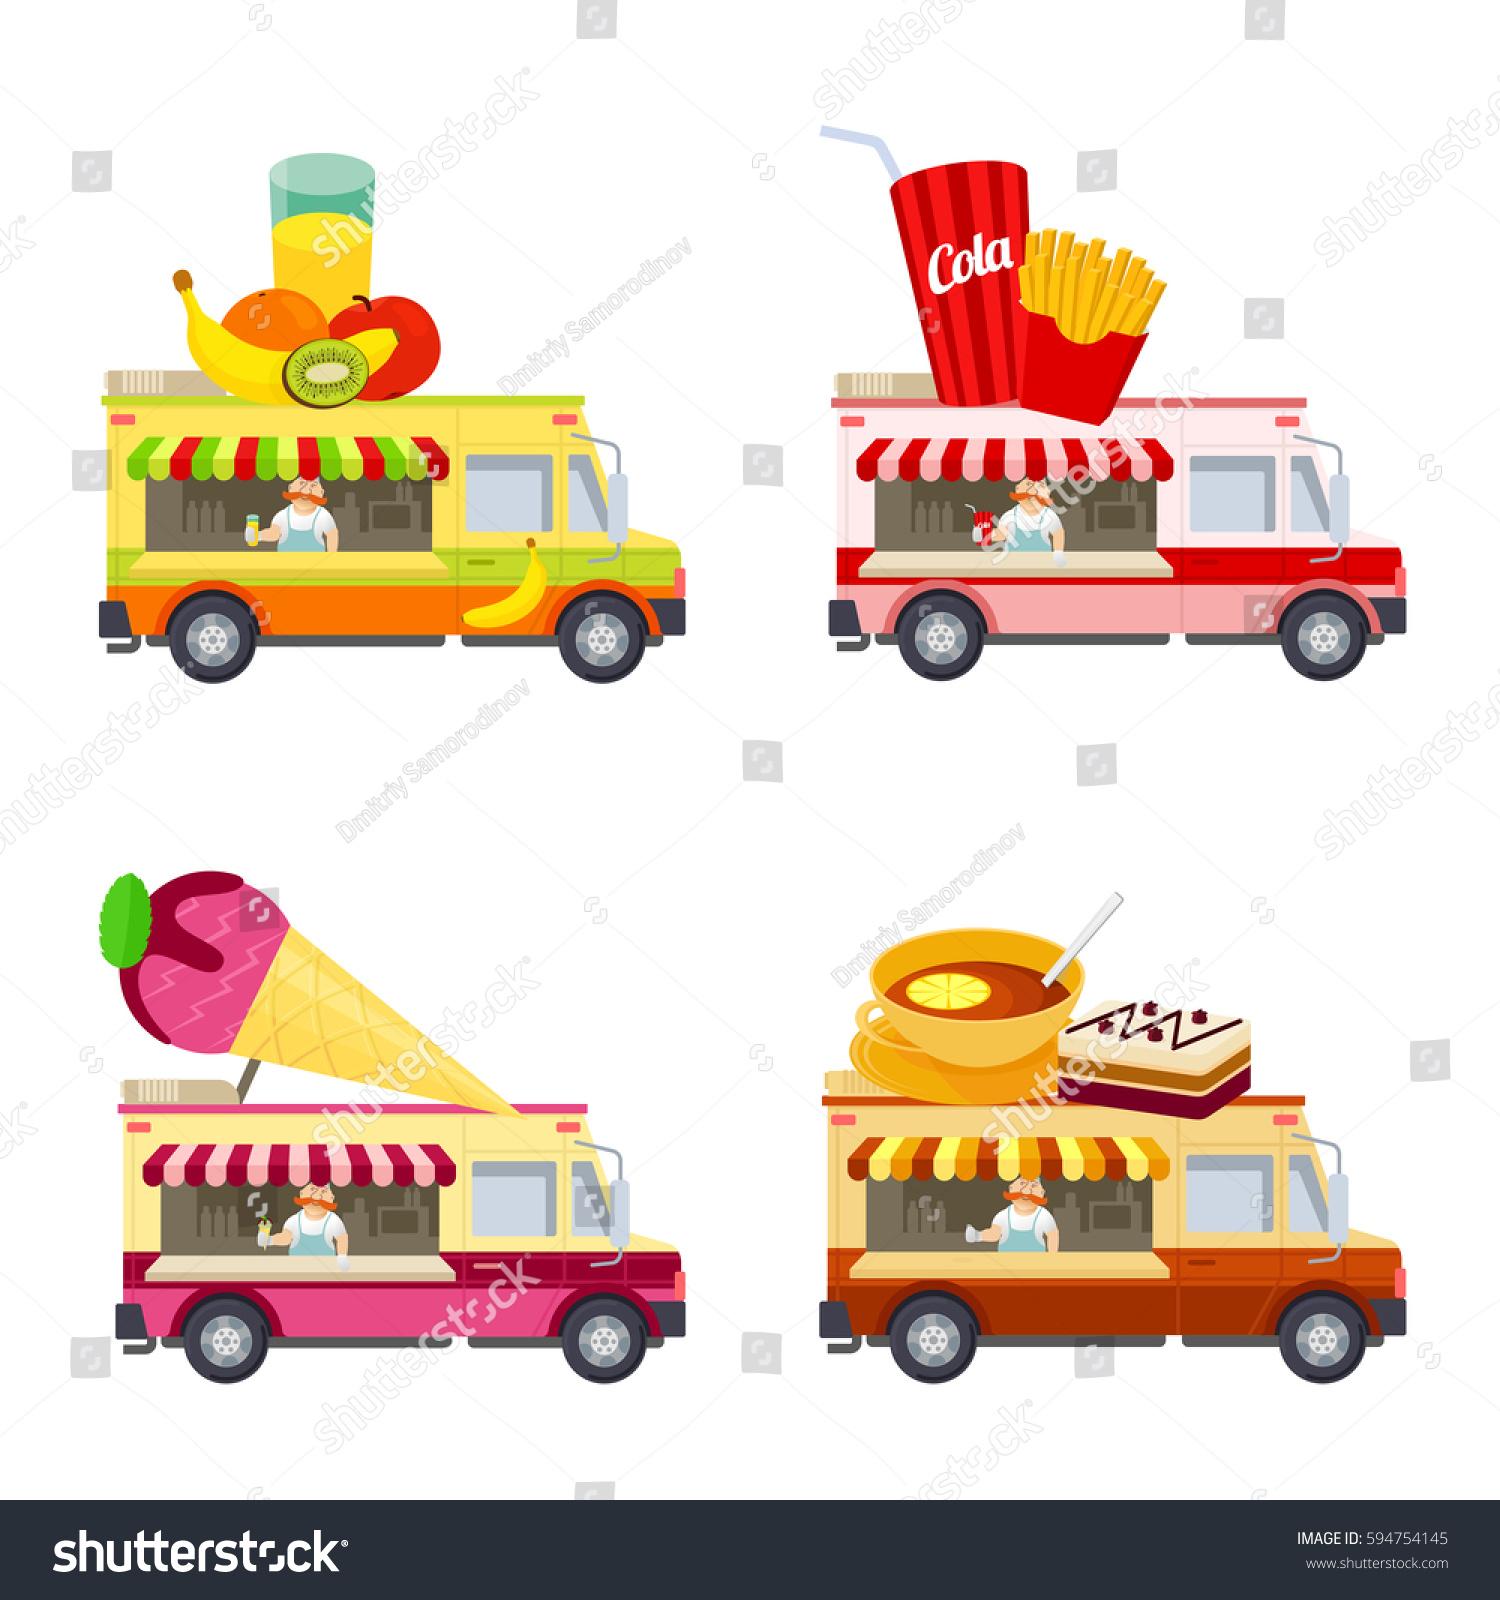 food truck vector flat illustration modern stock vector 594754145 shutterstock. Black Bedroom Furniture Sets. Home Design Ideas